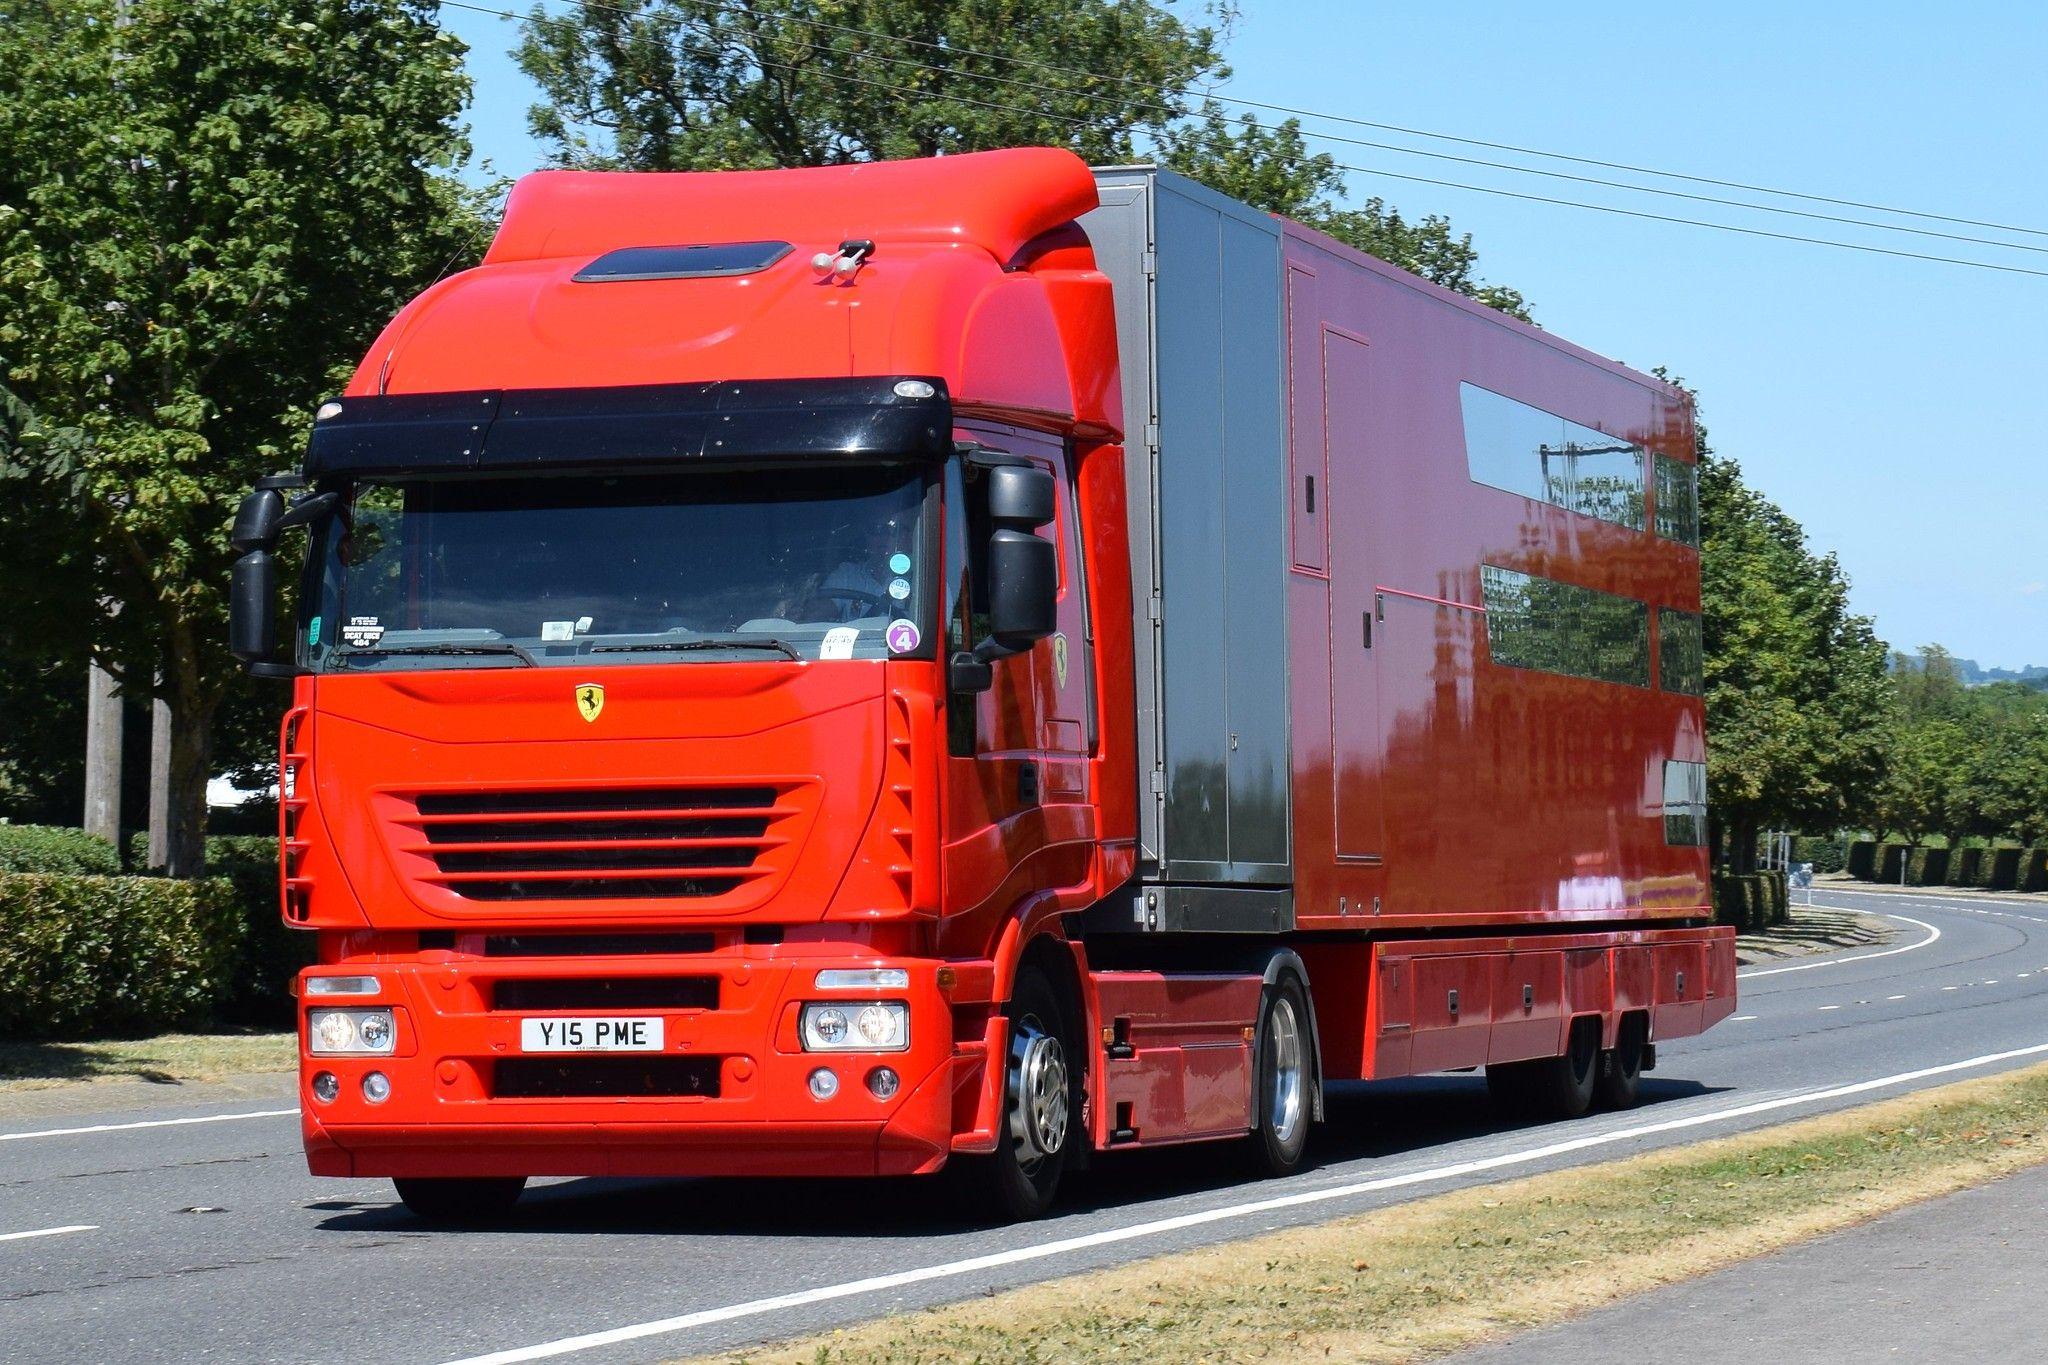 Y15pme Ferrari F1 Team Iveco In 2020 Ferrari F1 Ferrari Silverstone